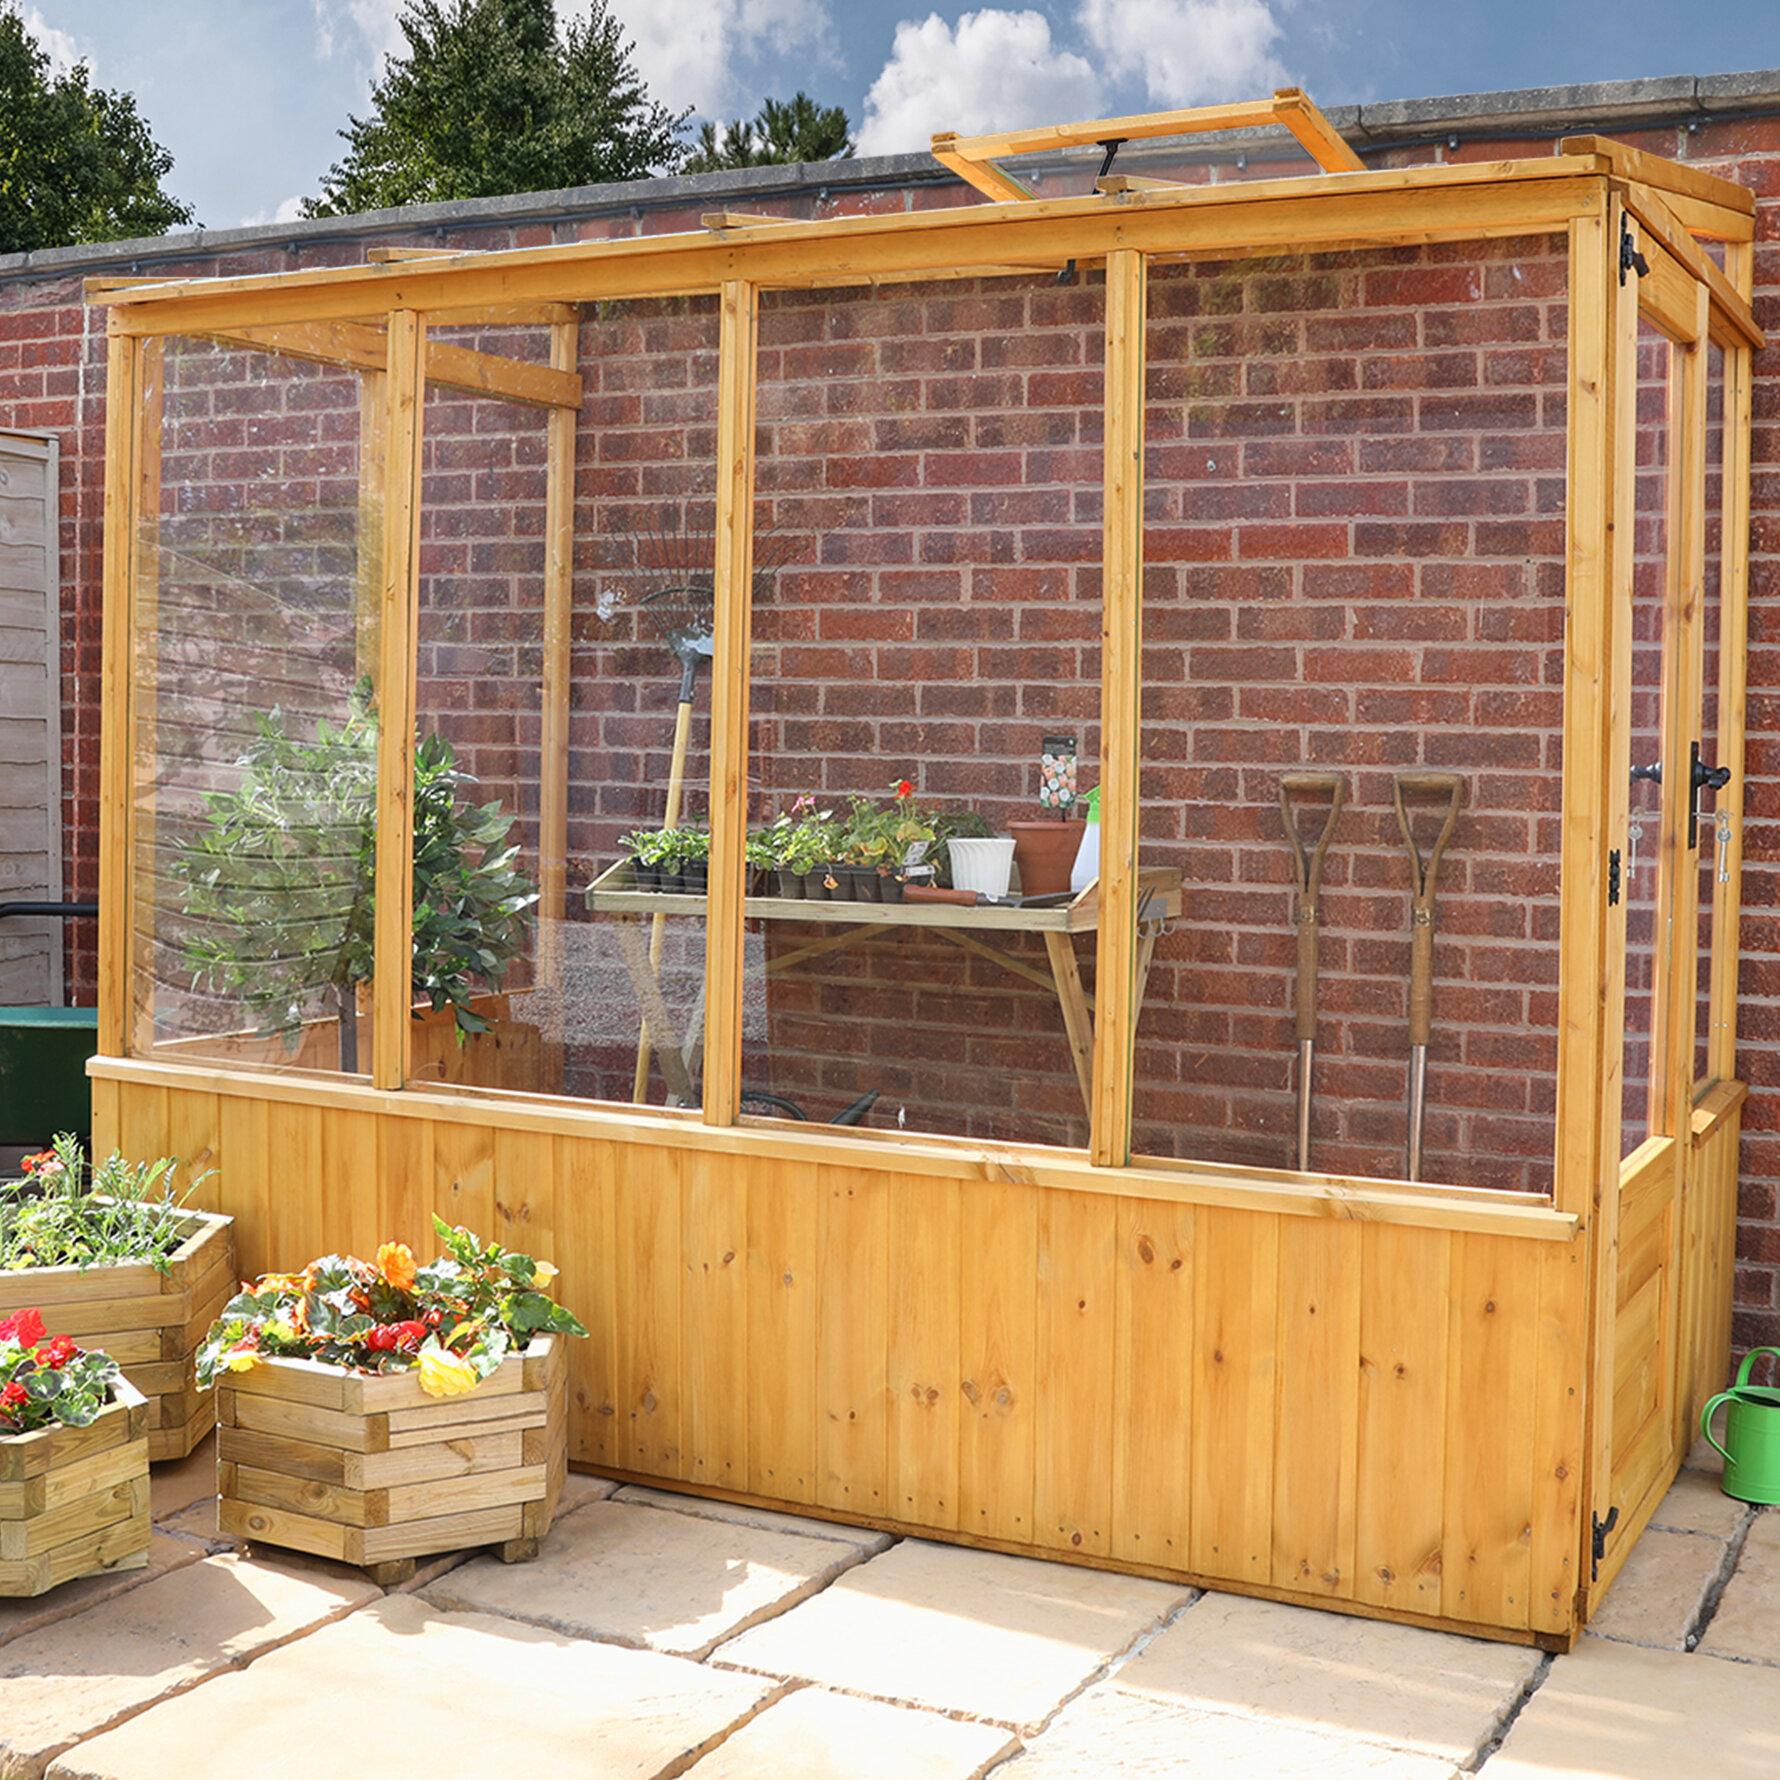 Mercia Garden Products Premium 4 Ft. W x 8 Ft. D Pent Mini ...